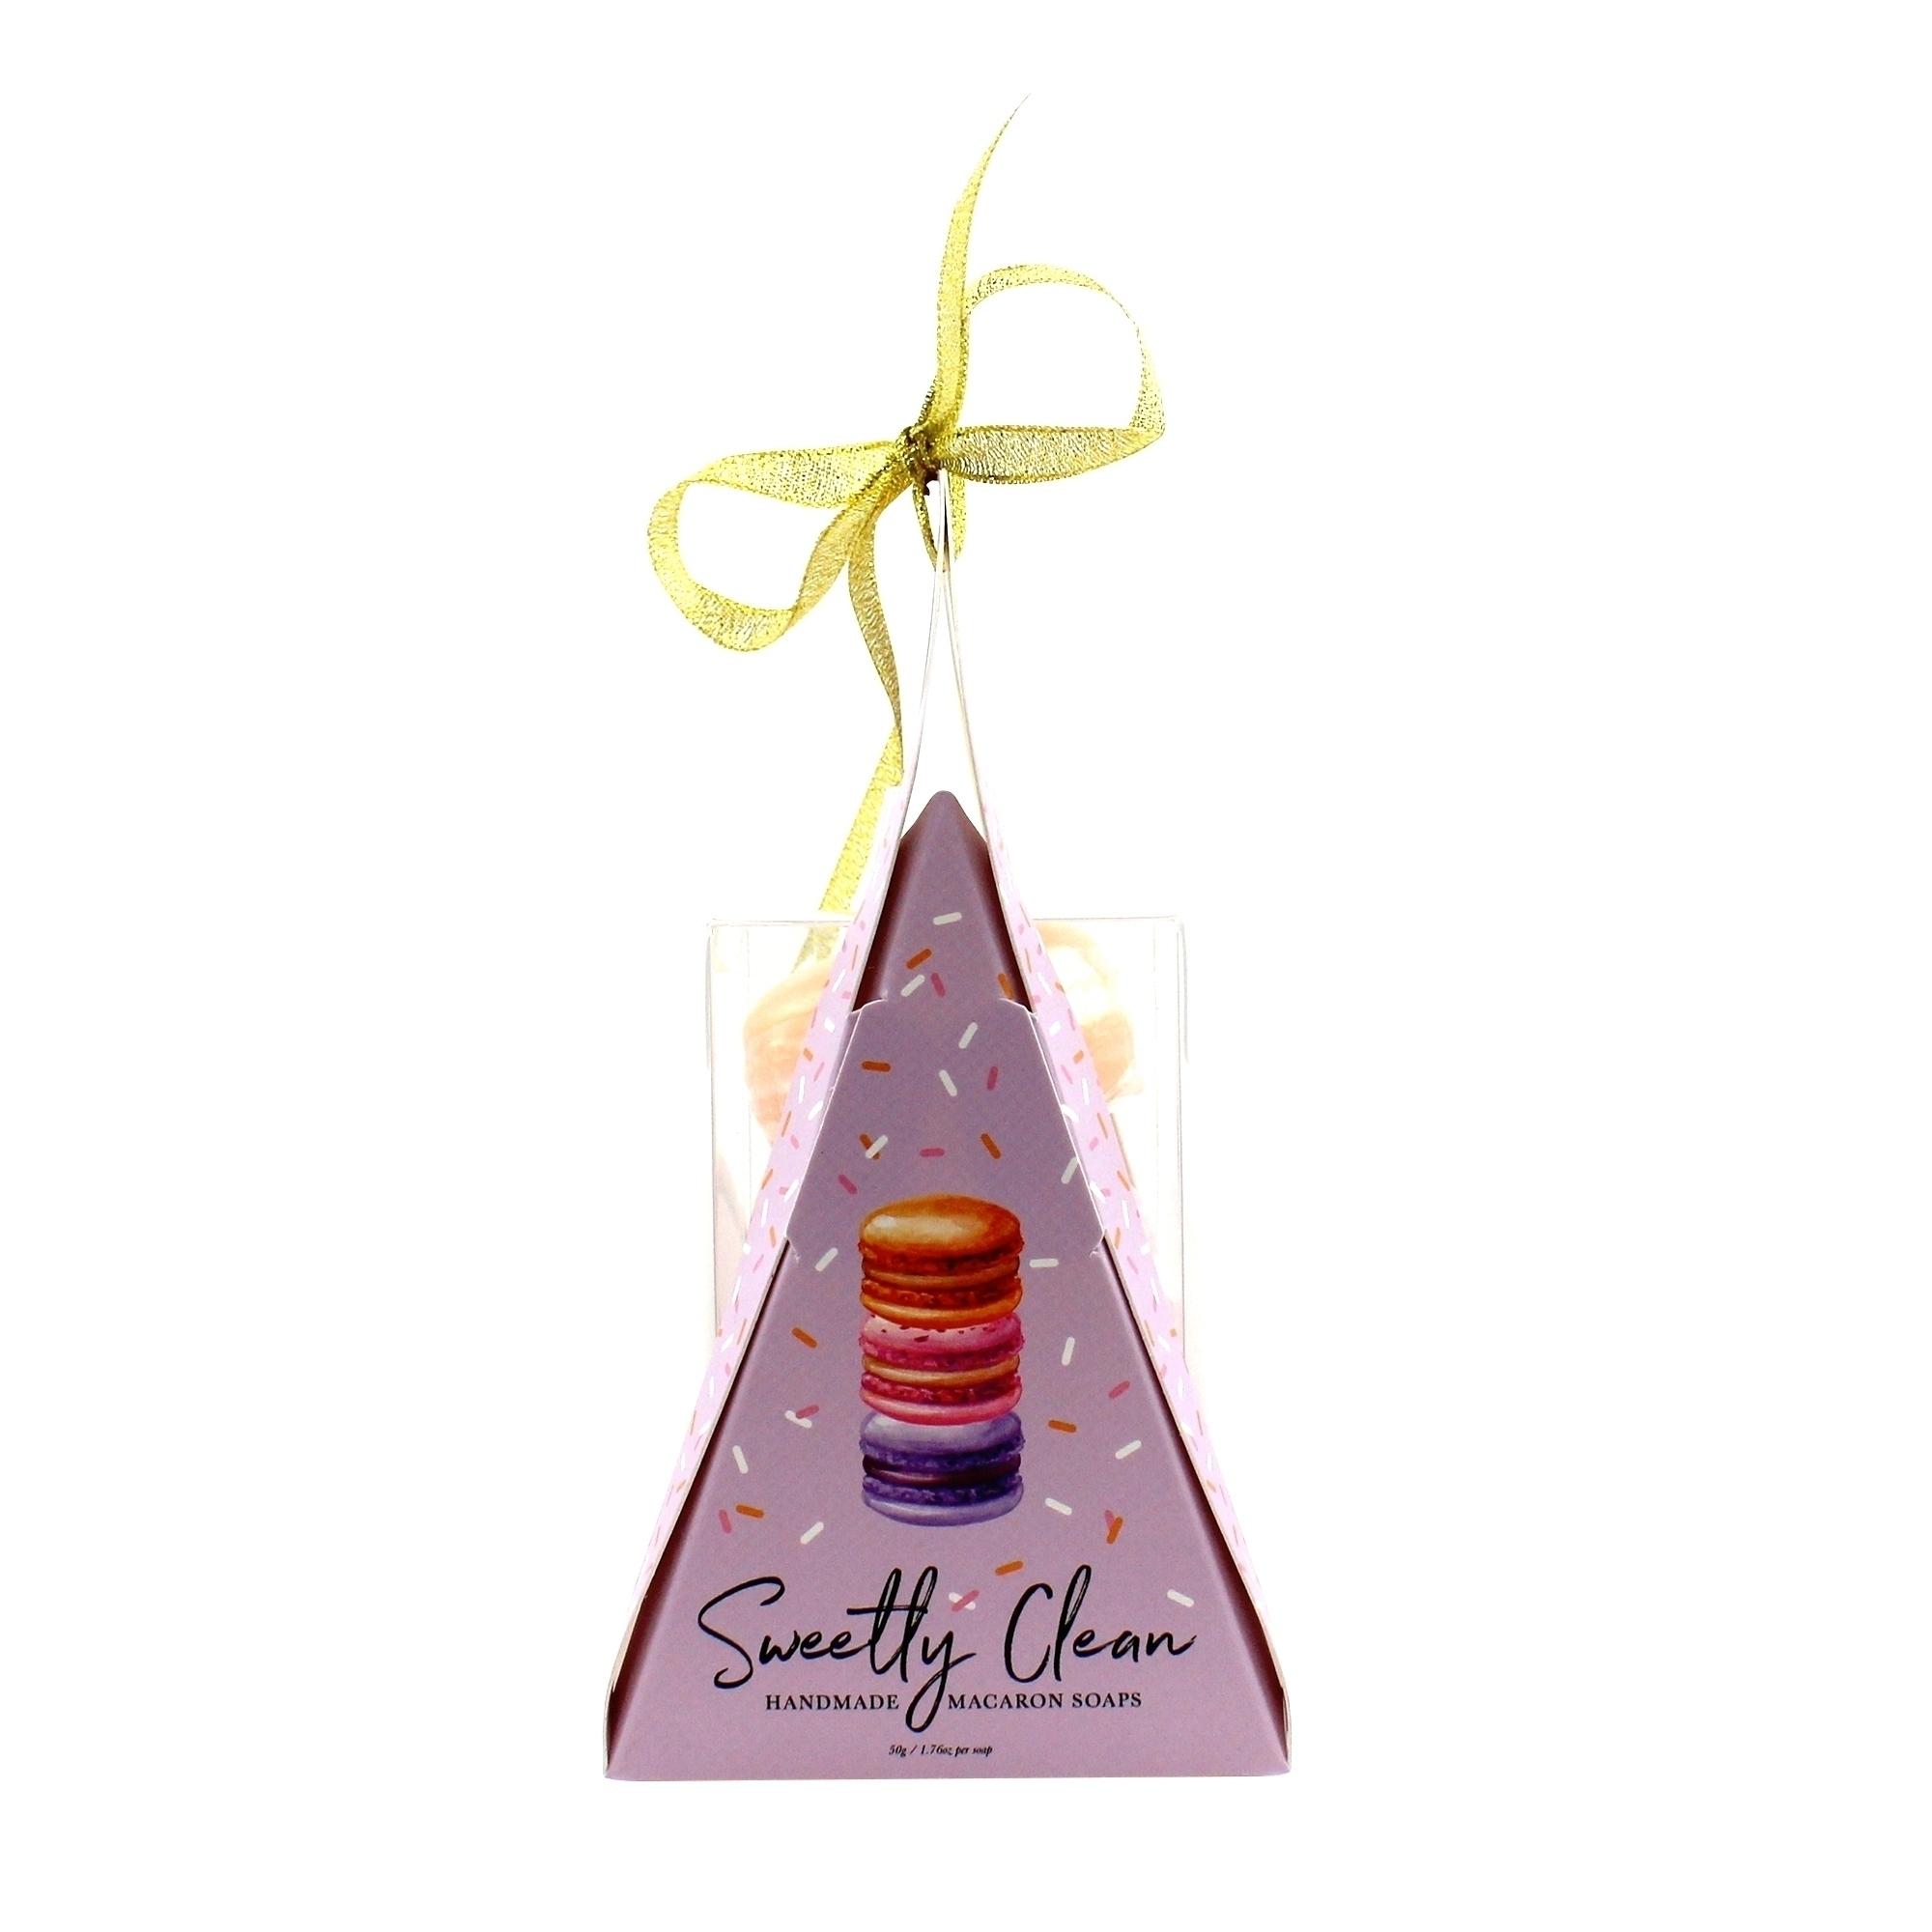 """Sweetly Clean"" Handmade Macaron Soaps"